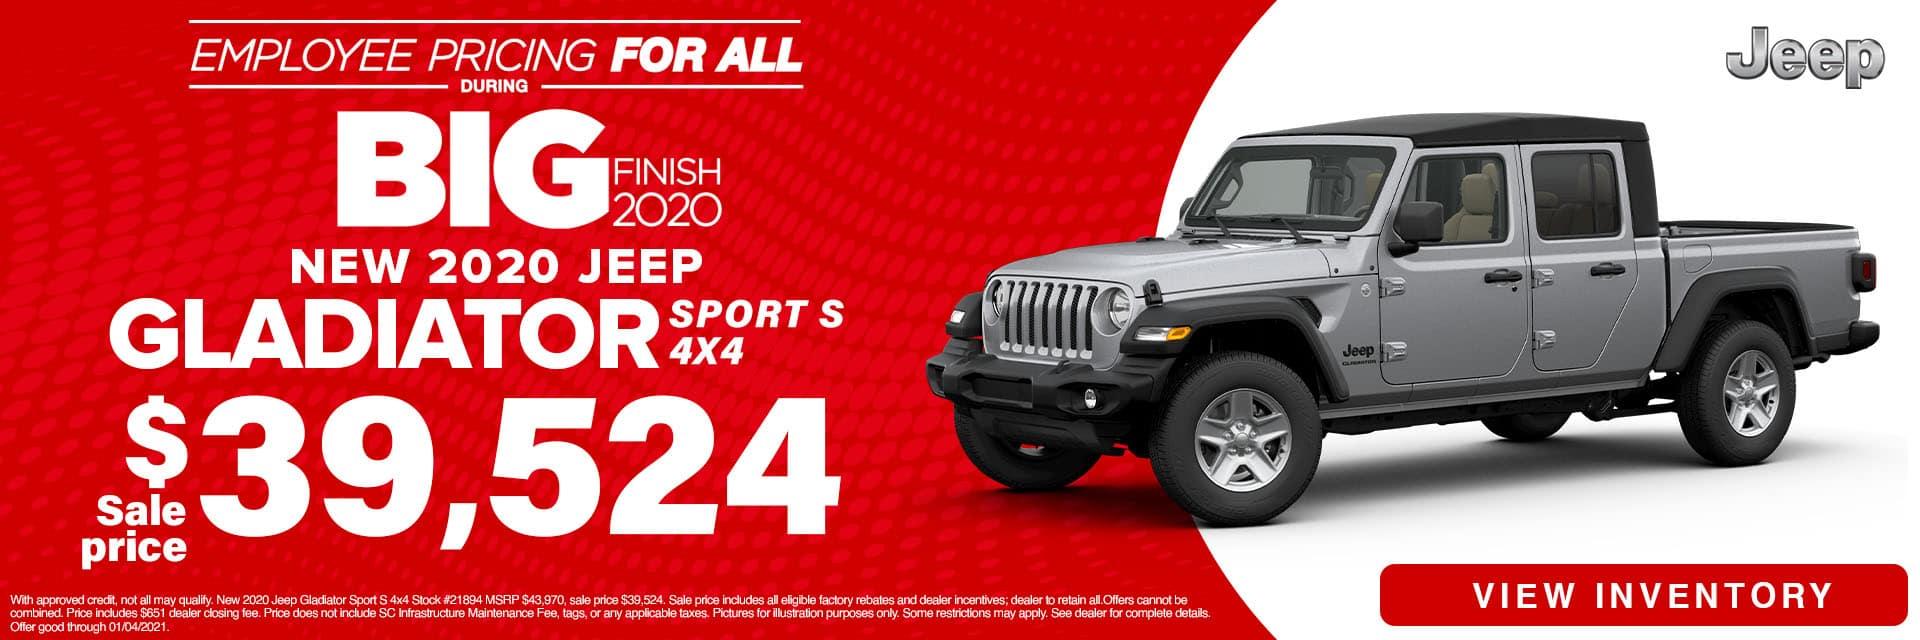 SLCJ-December 2020-2020 Jeep Gladiator